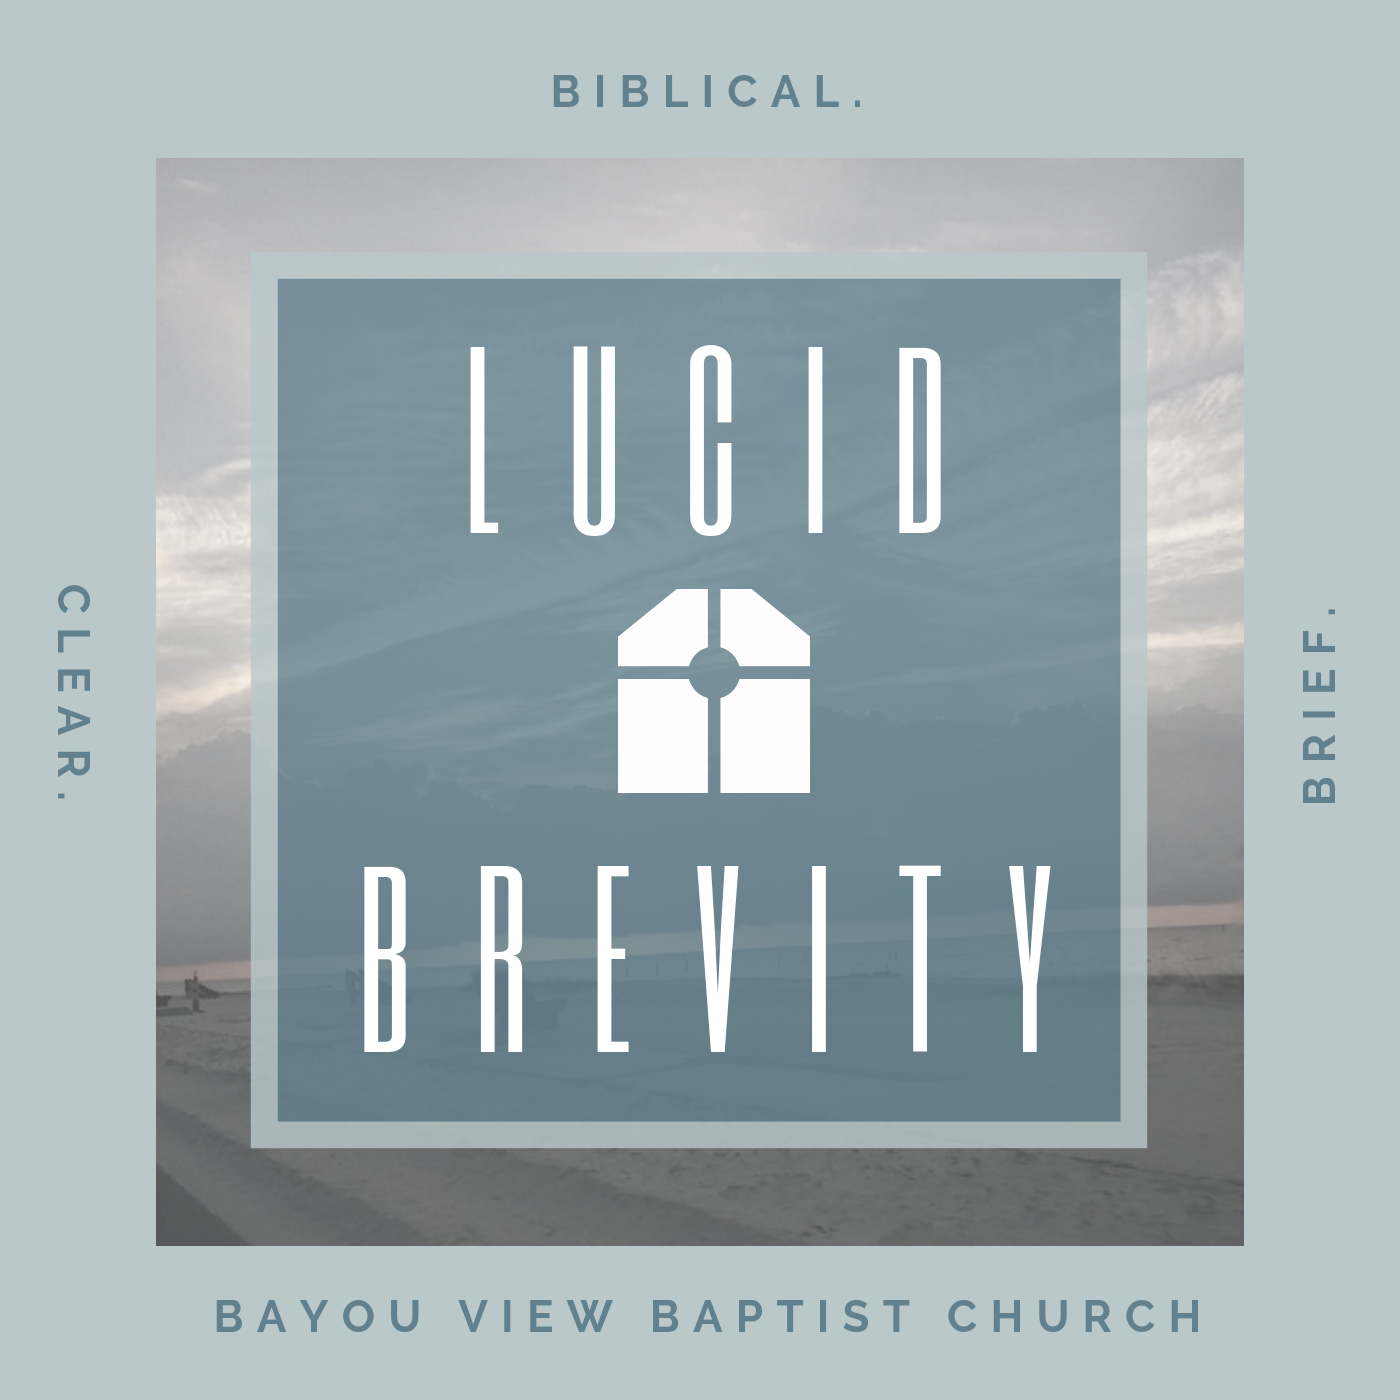 Lucid Brevity - Bayou View Baptist Church show art